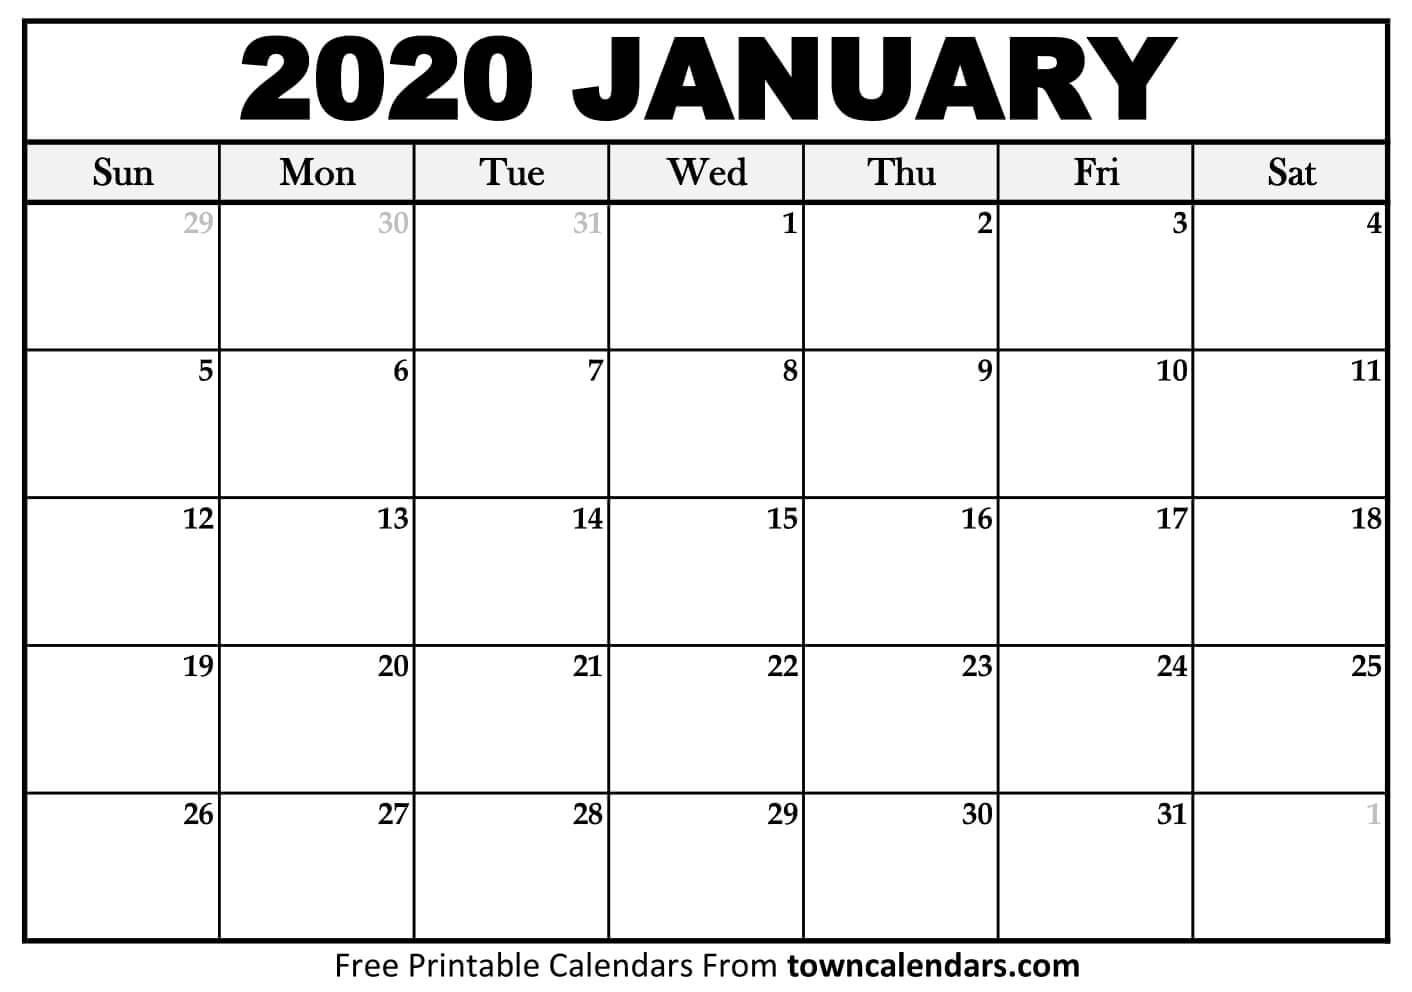 2020 Calendar Printable - Towncalendars  2020 Calendar Printable Free